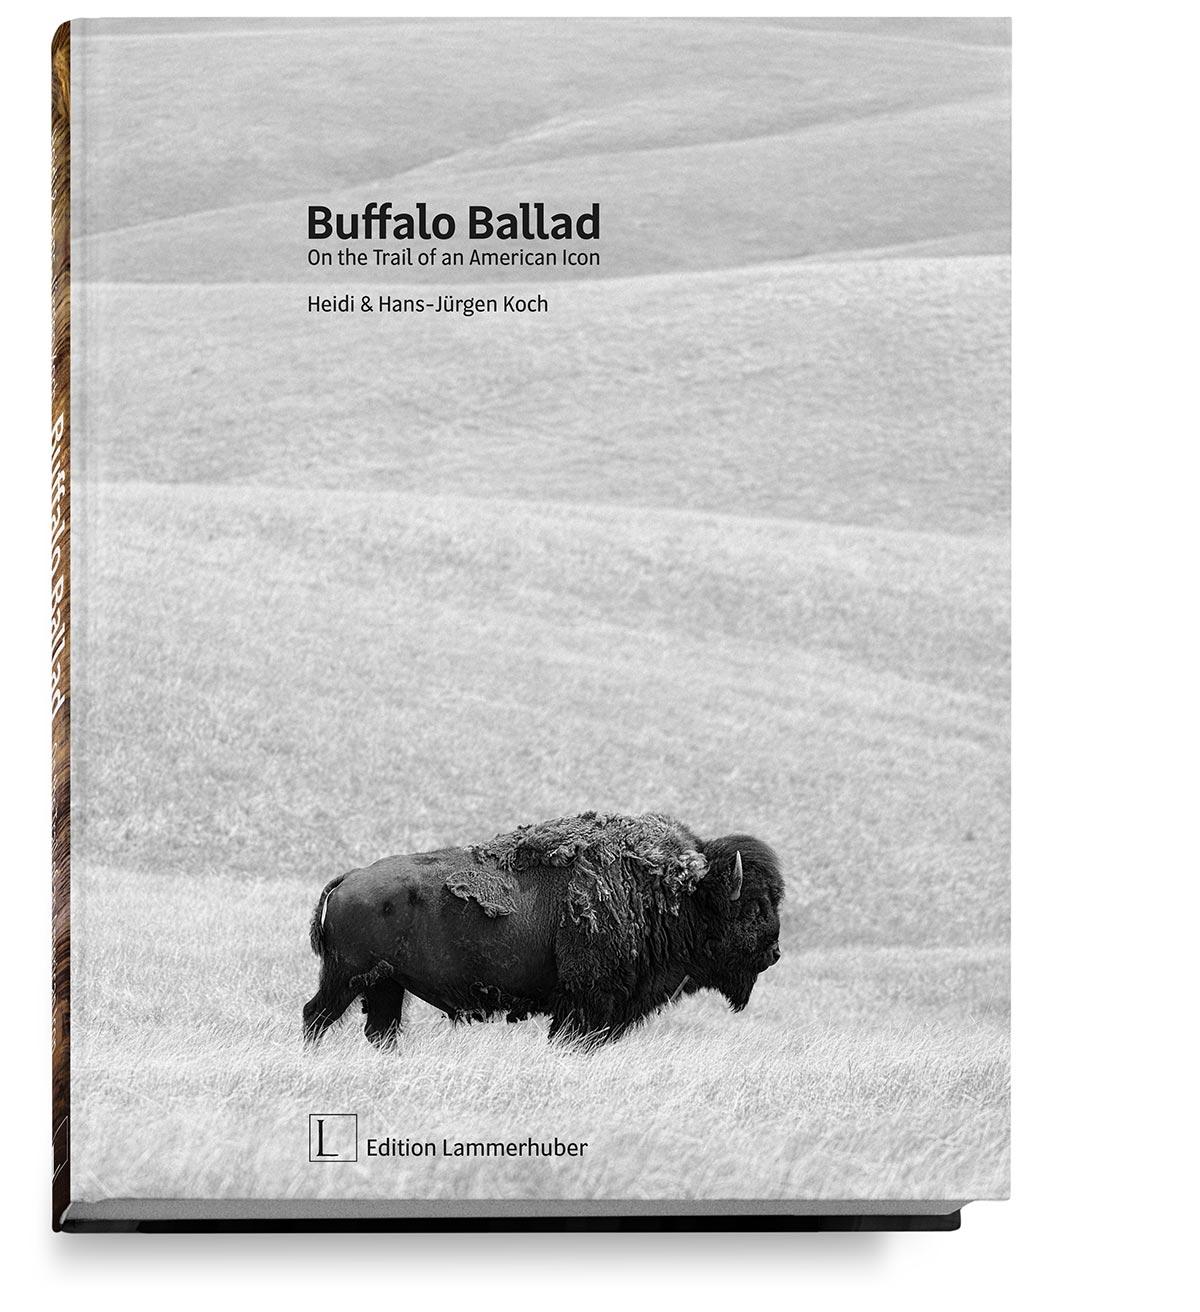 lammerhuber-buffaloballad-hardcover